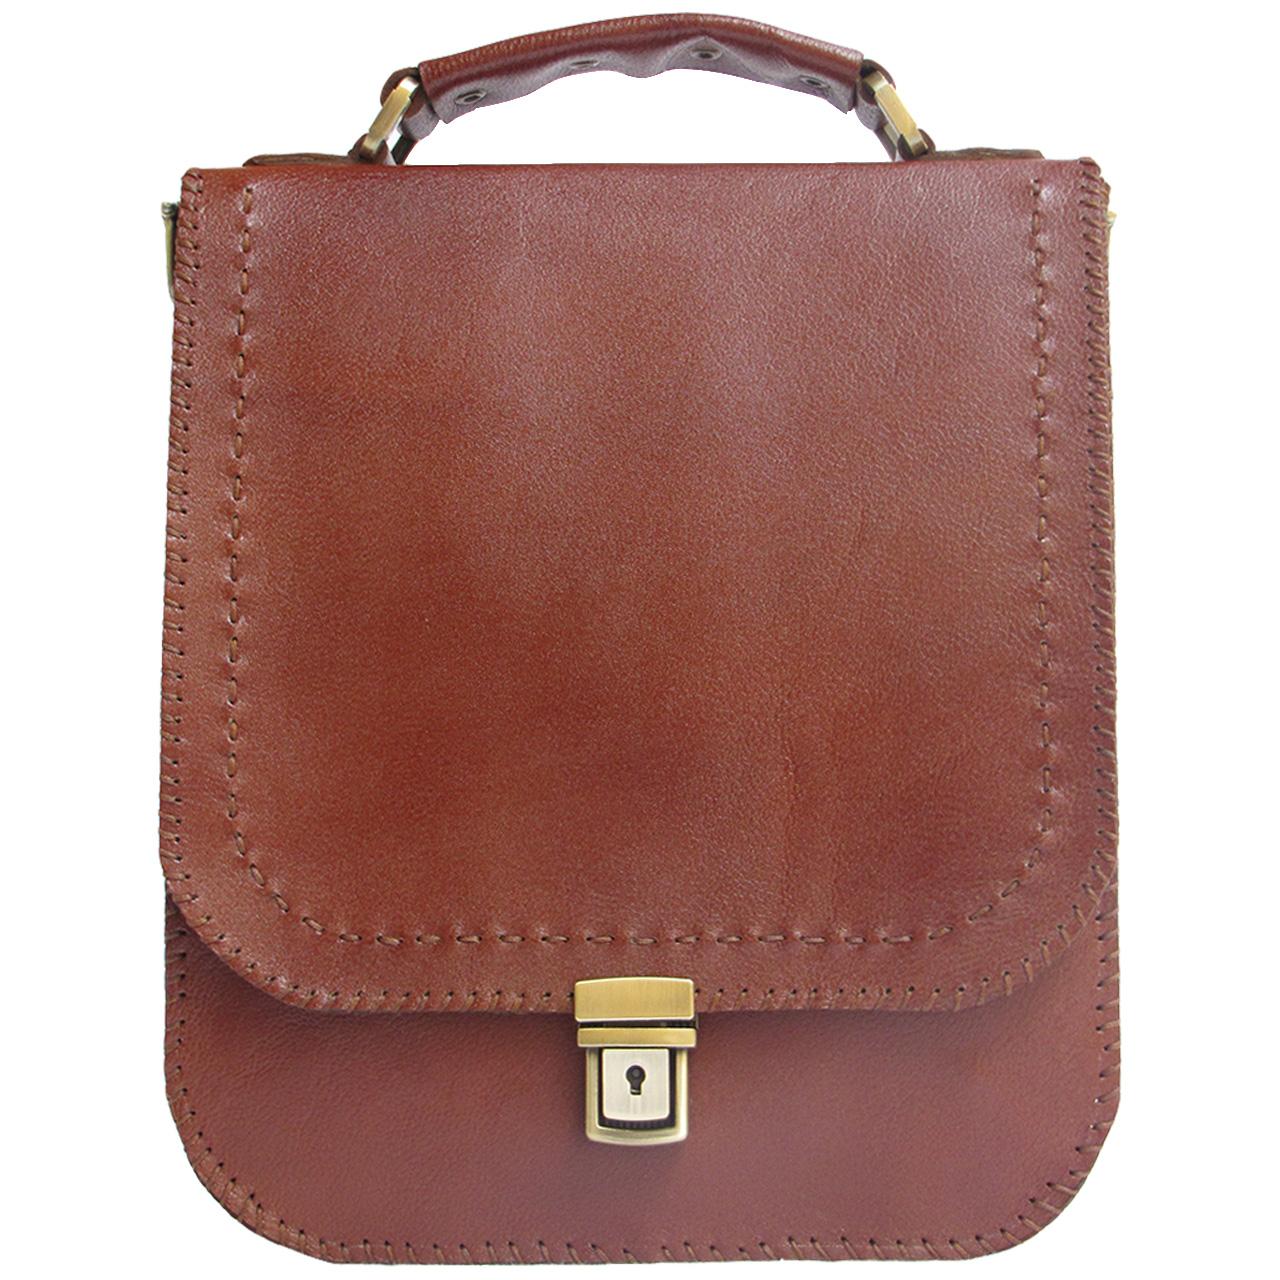 کیف اداری چرم طبیعی دستدوز مدل یونیک کد 005